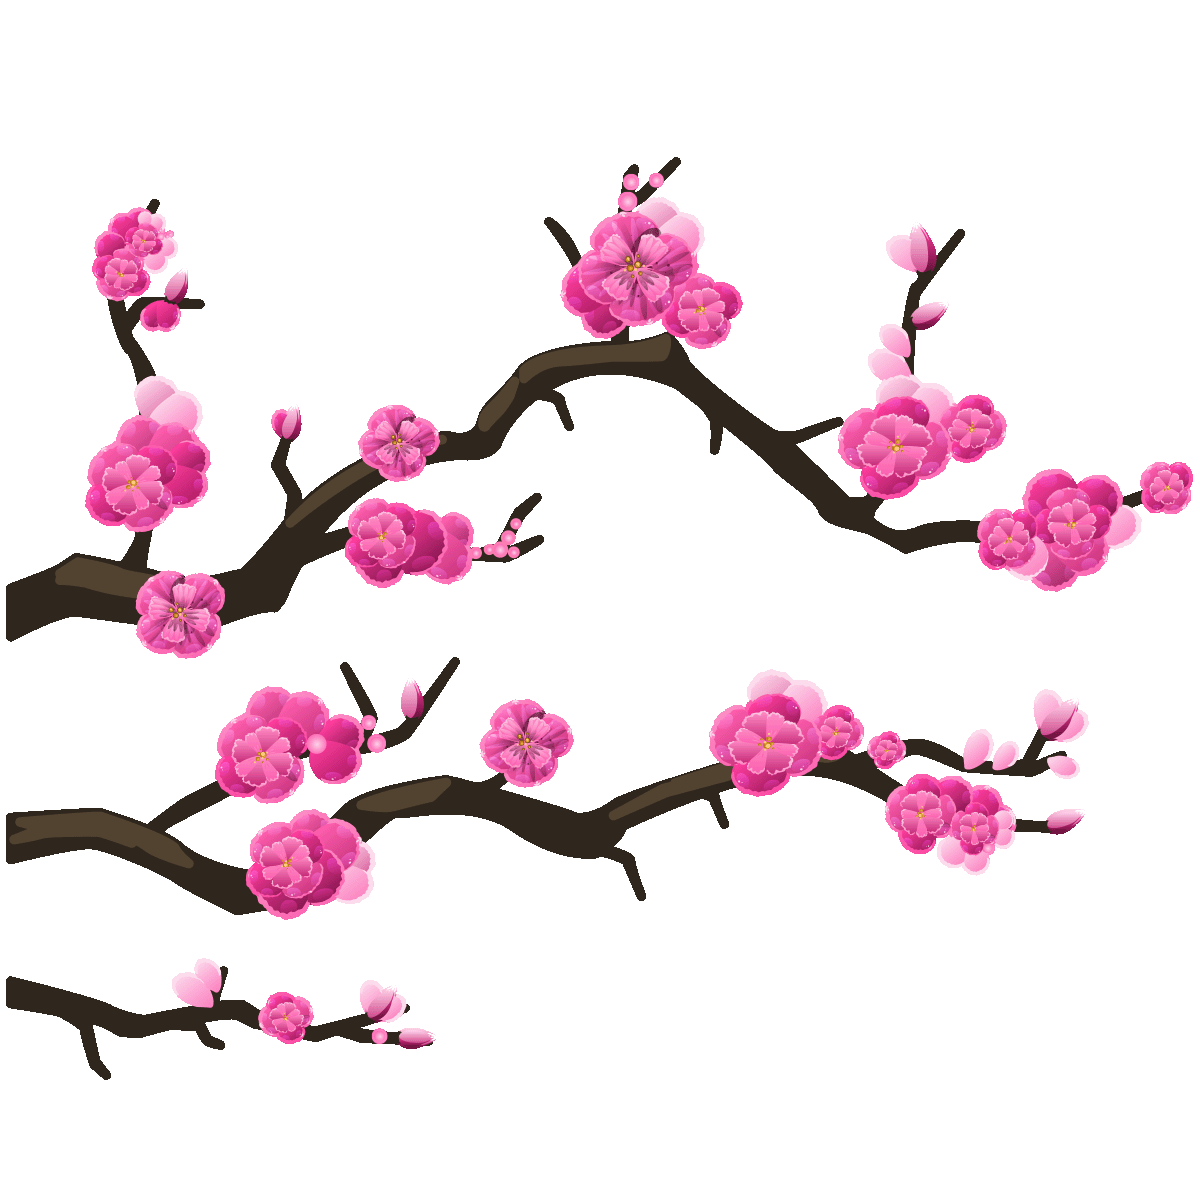 sticker branches cerisier du japon stickers villes et. Black Bedroom Furniture Sets. Home Design Ideas